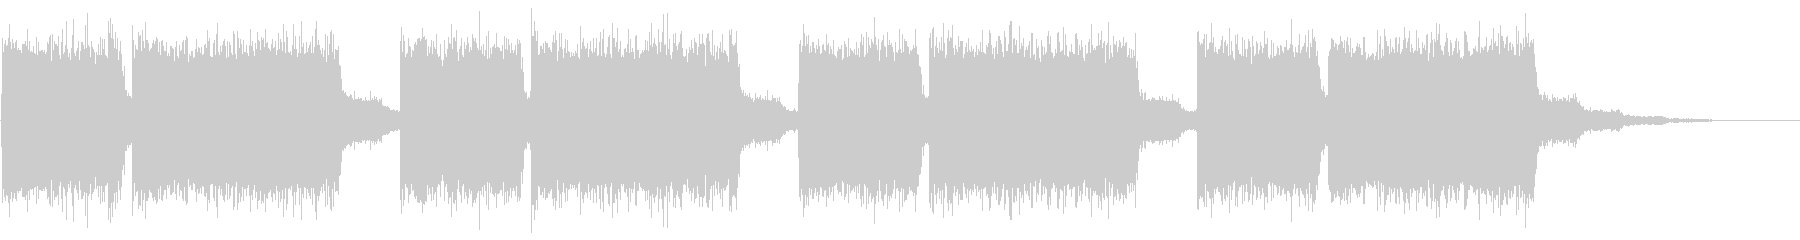 KANT近未来映画アニメ的アラーム音3の未再生の波形